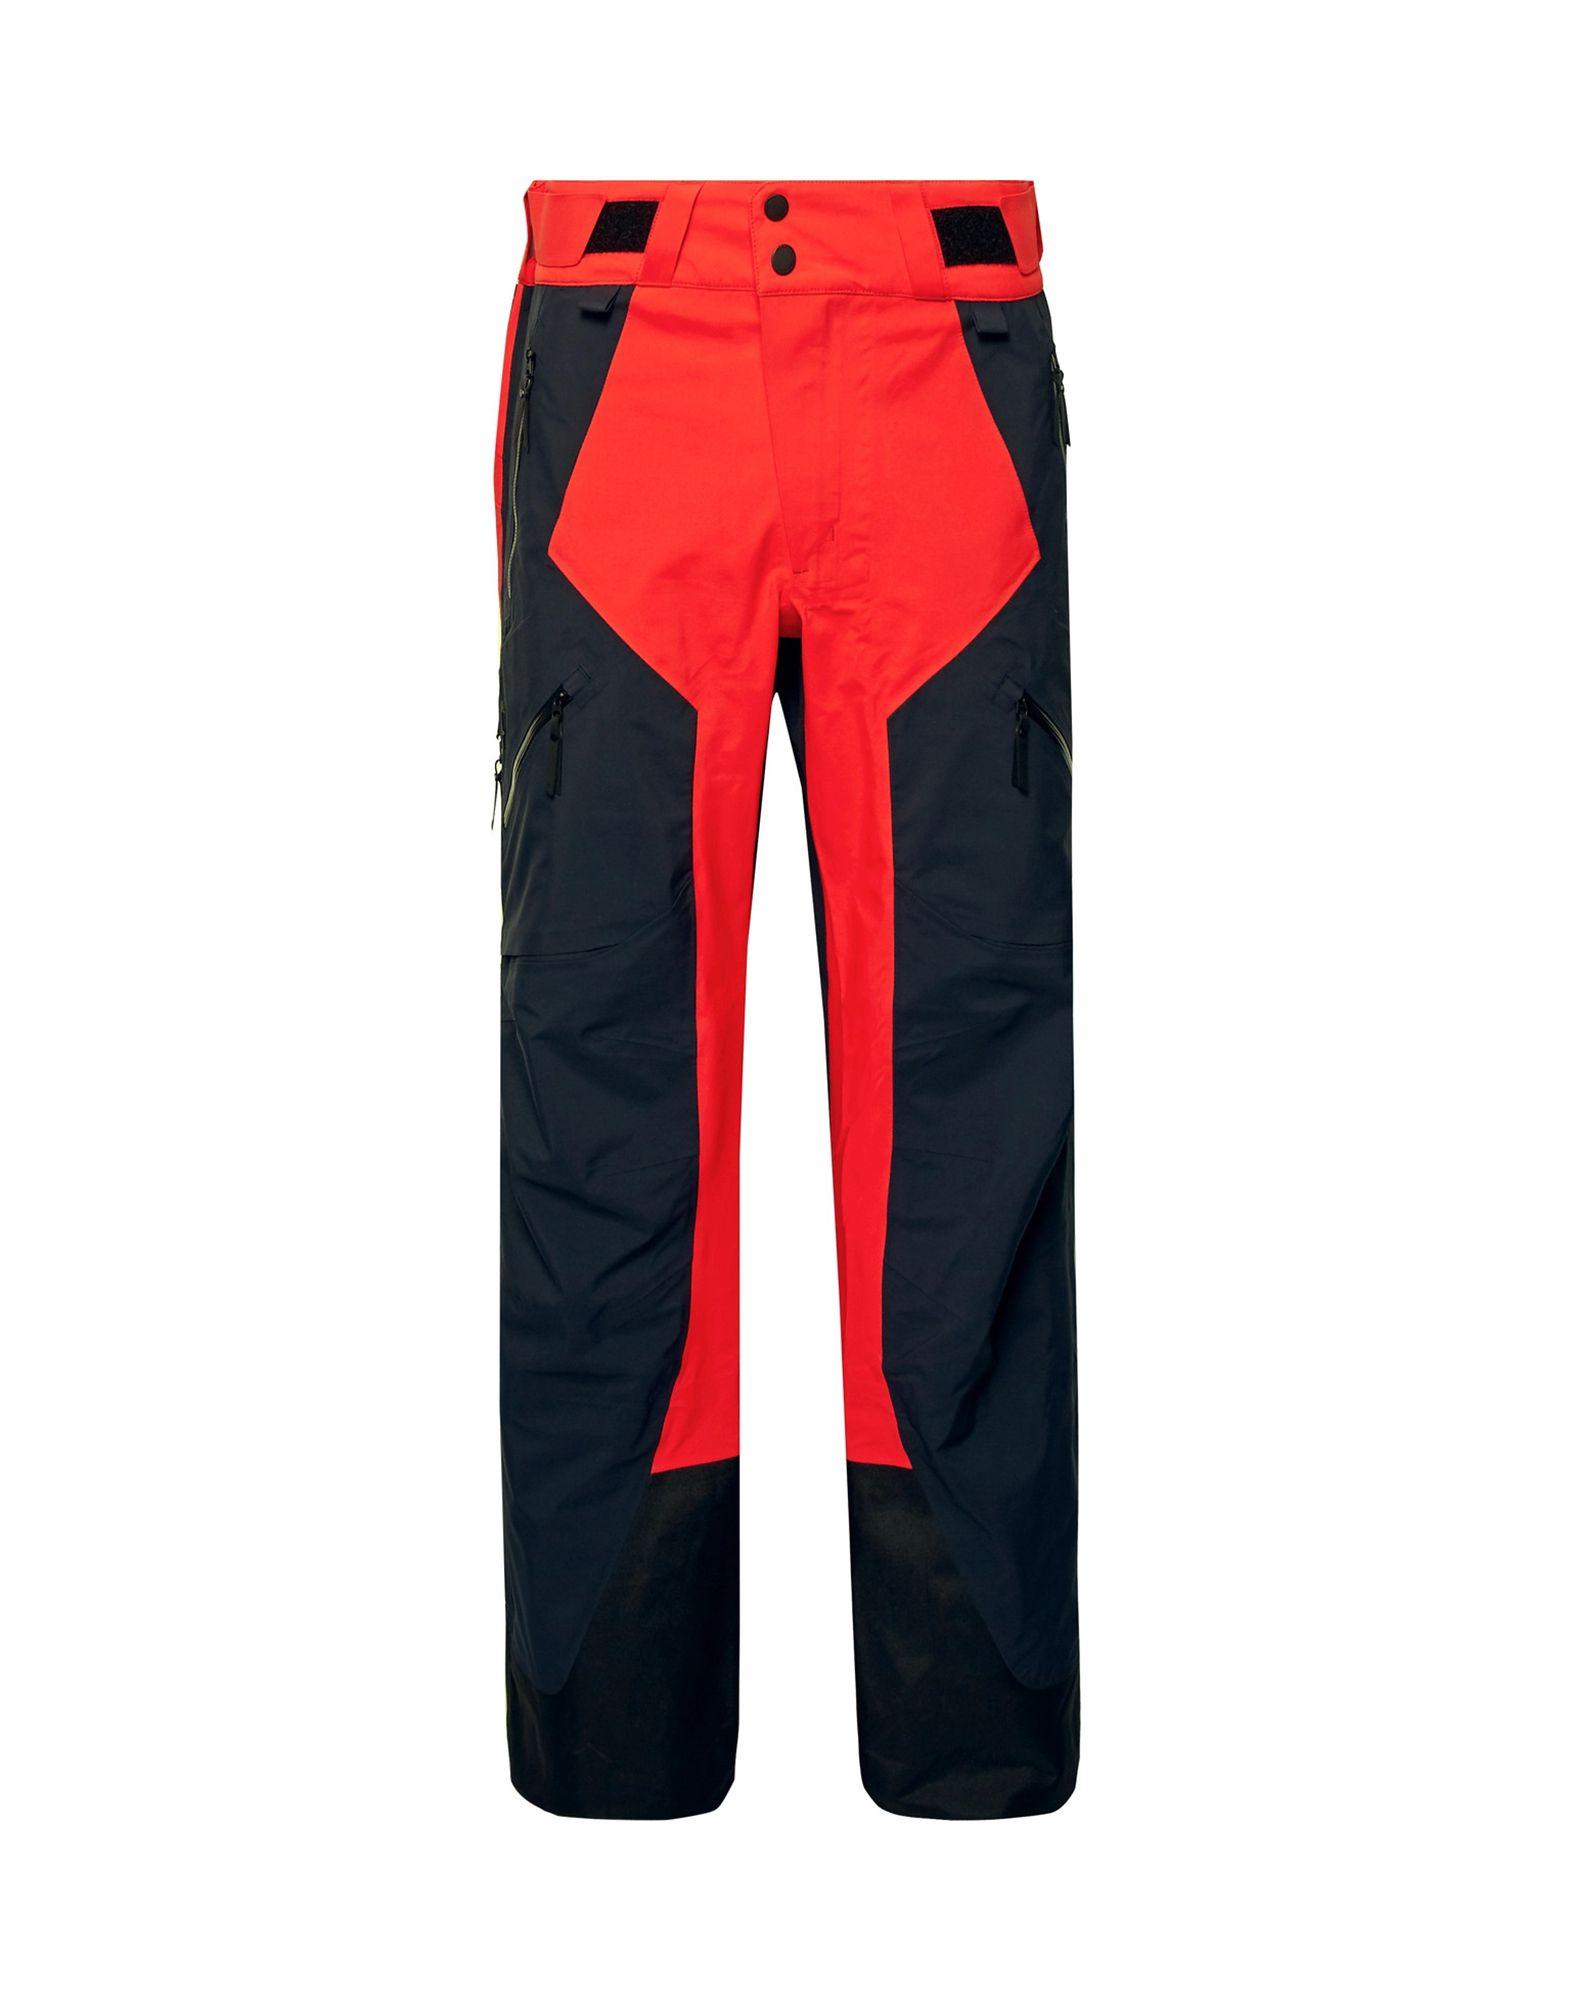 PEAK PERFORMANCE メンズ スキーウェア ダークブルー